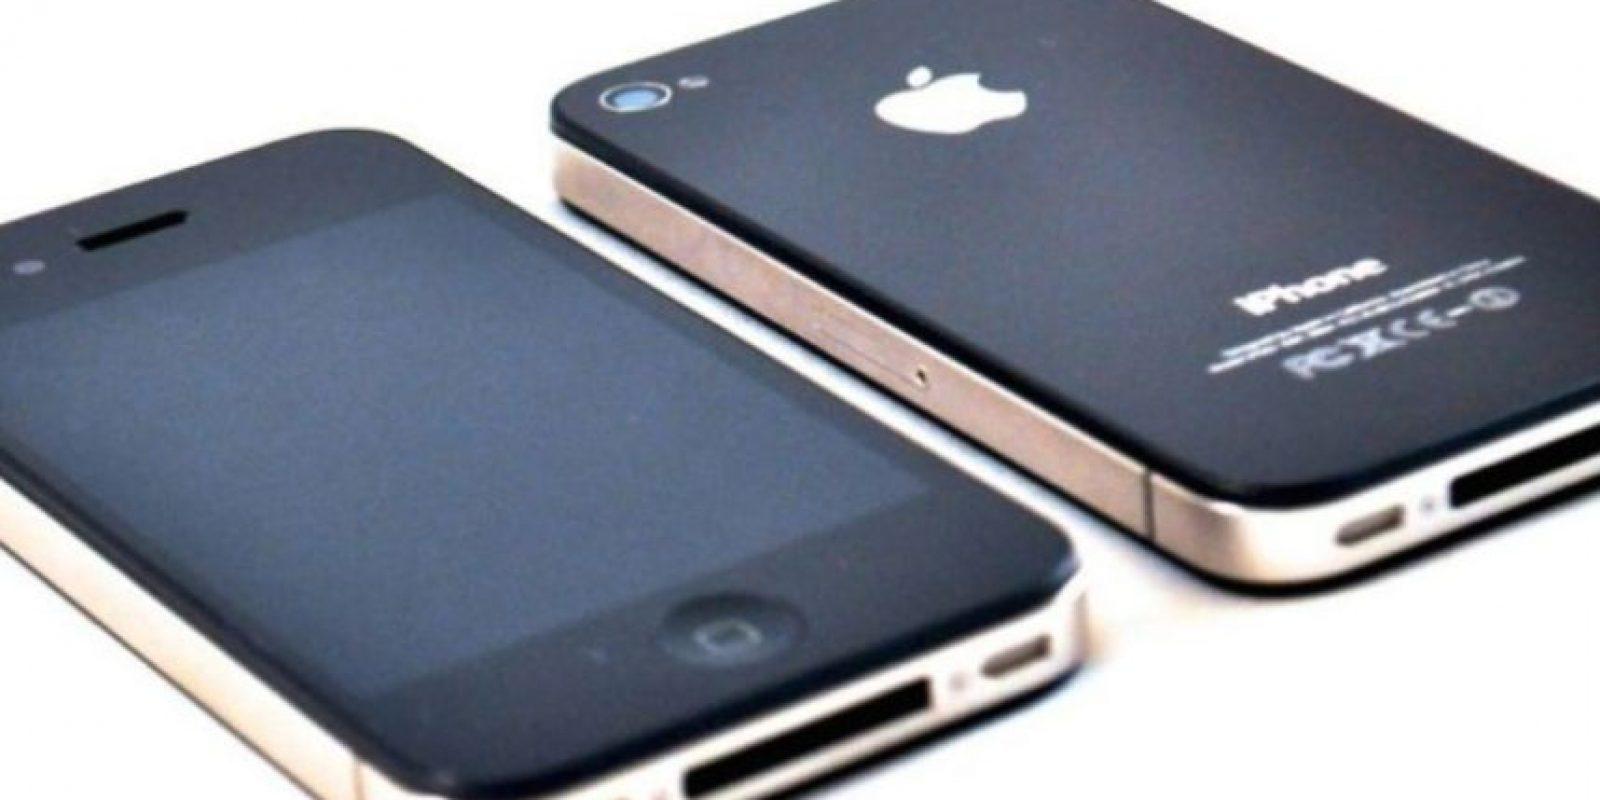 iPhone 4 (2010) Foto:Wikipedia